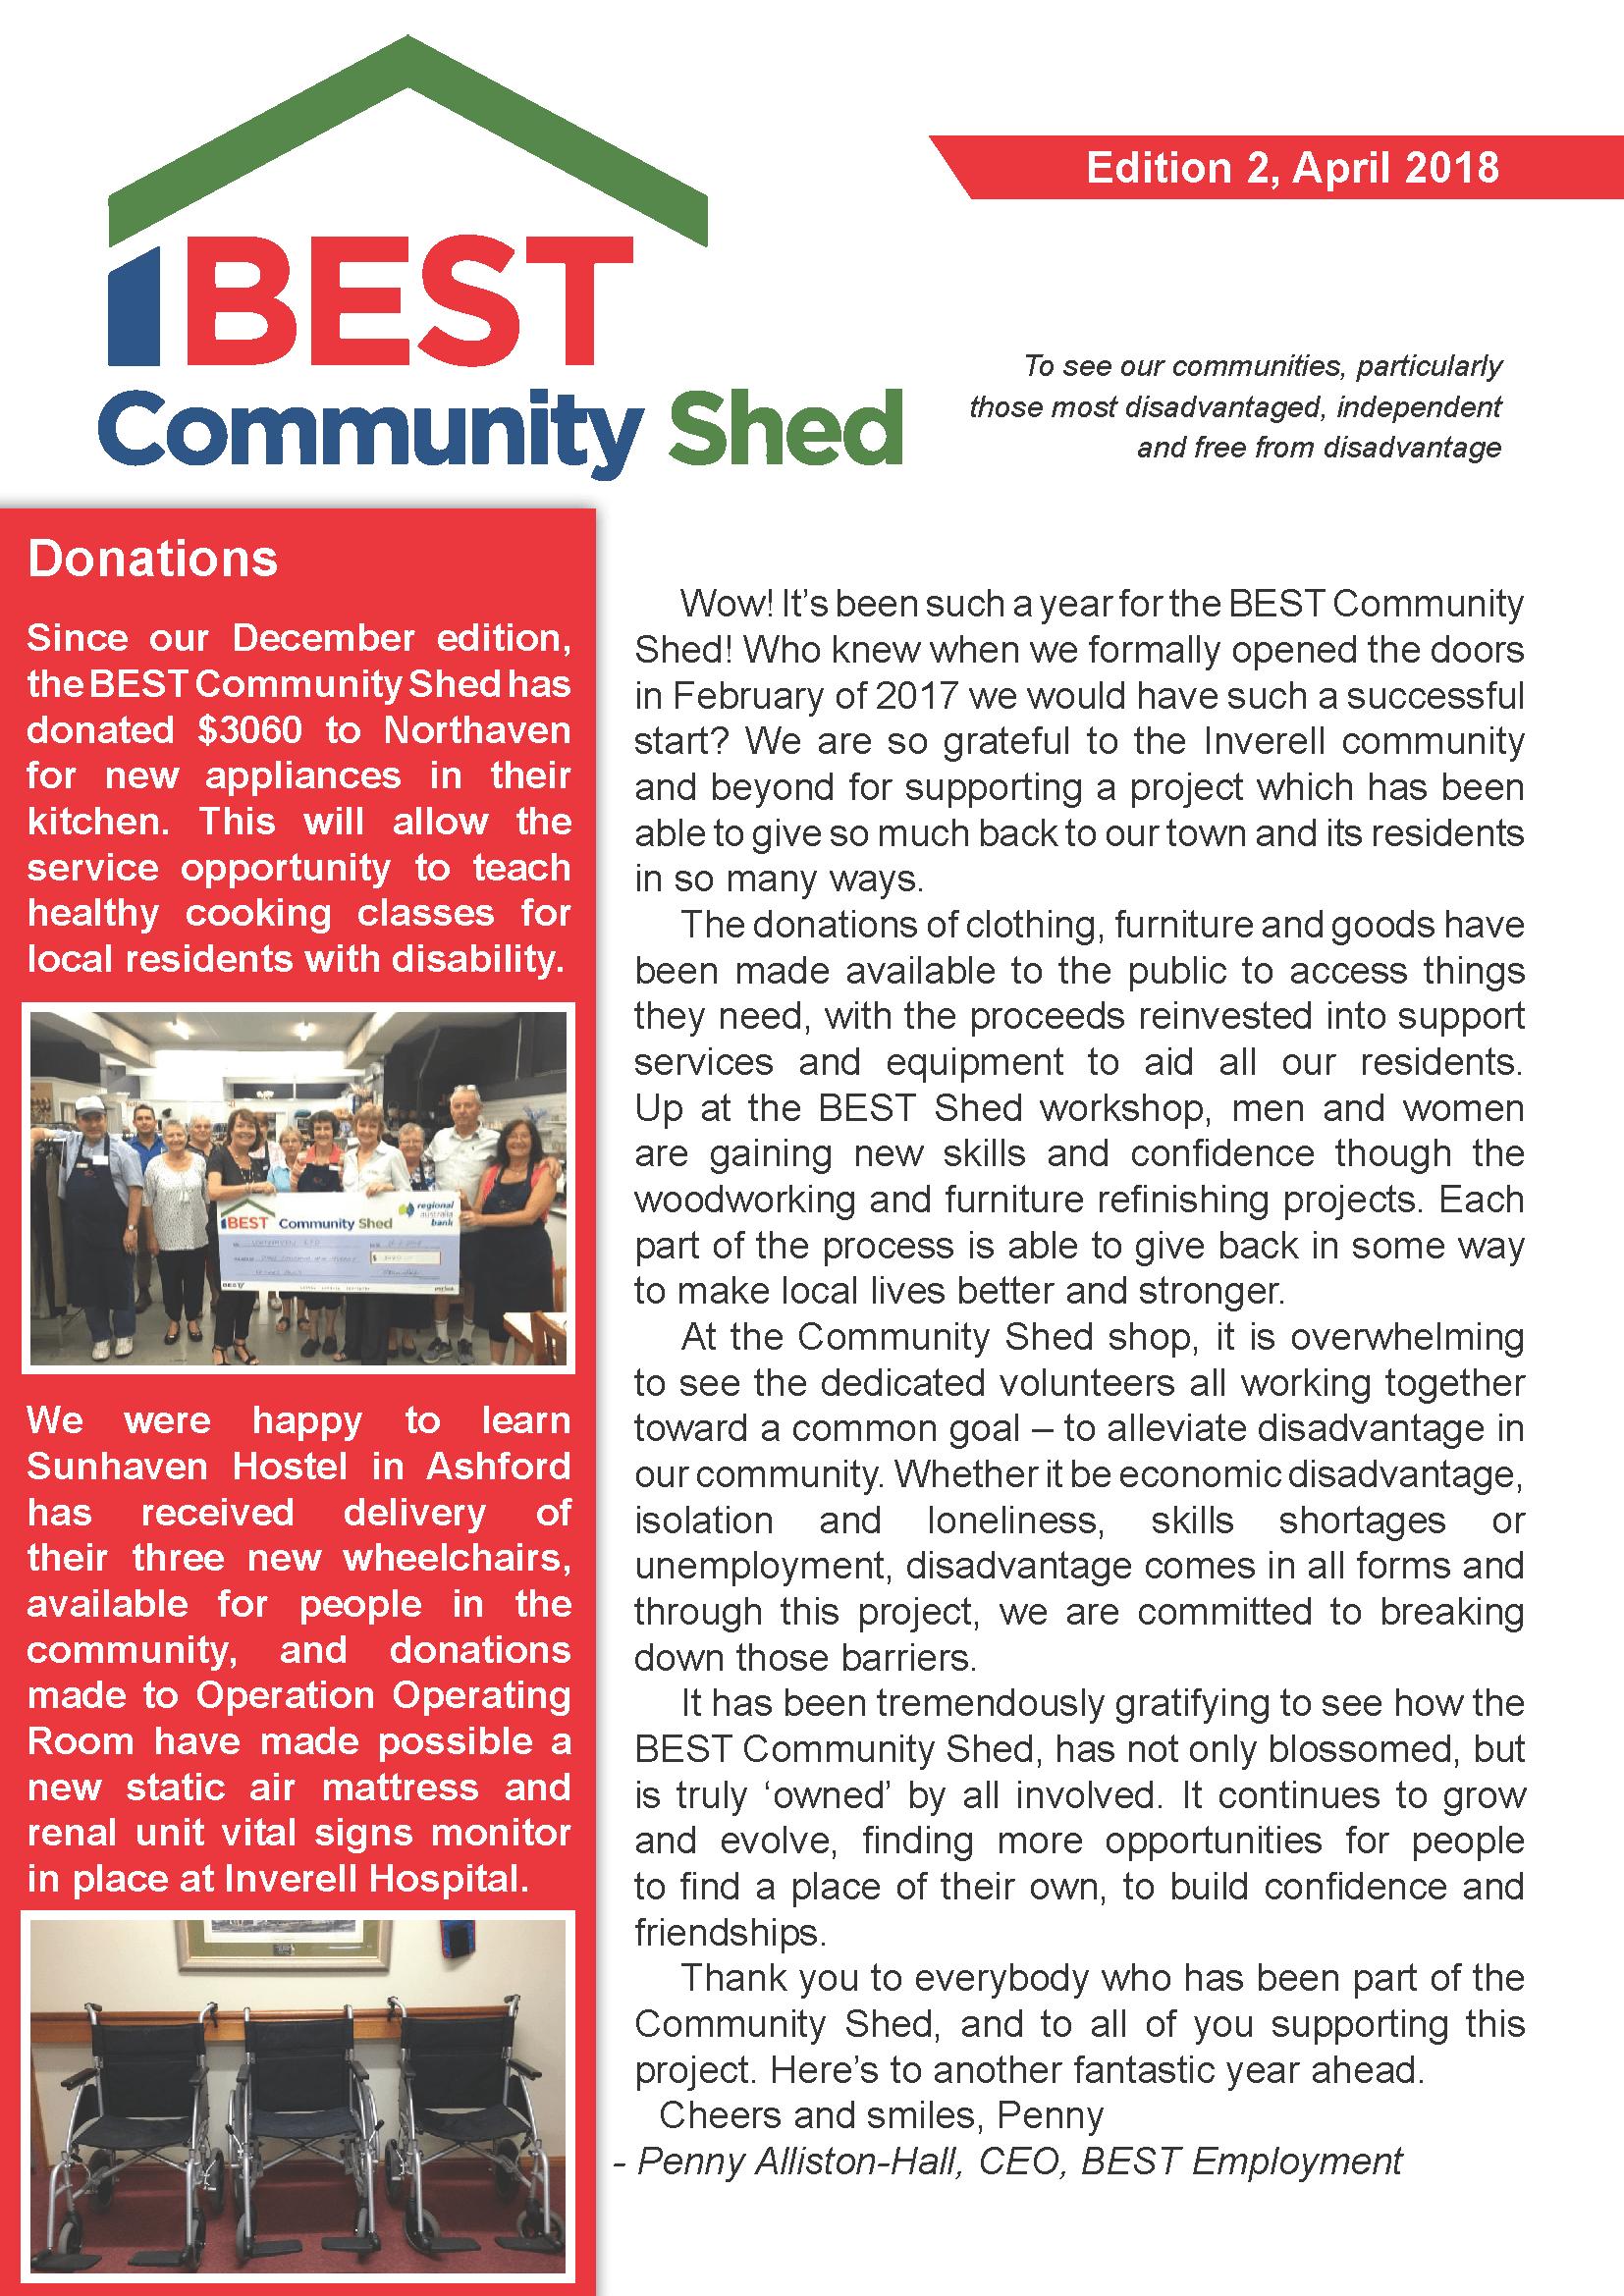 BCS Newsletter Edition 2, April 2018